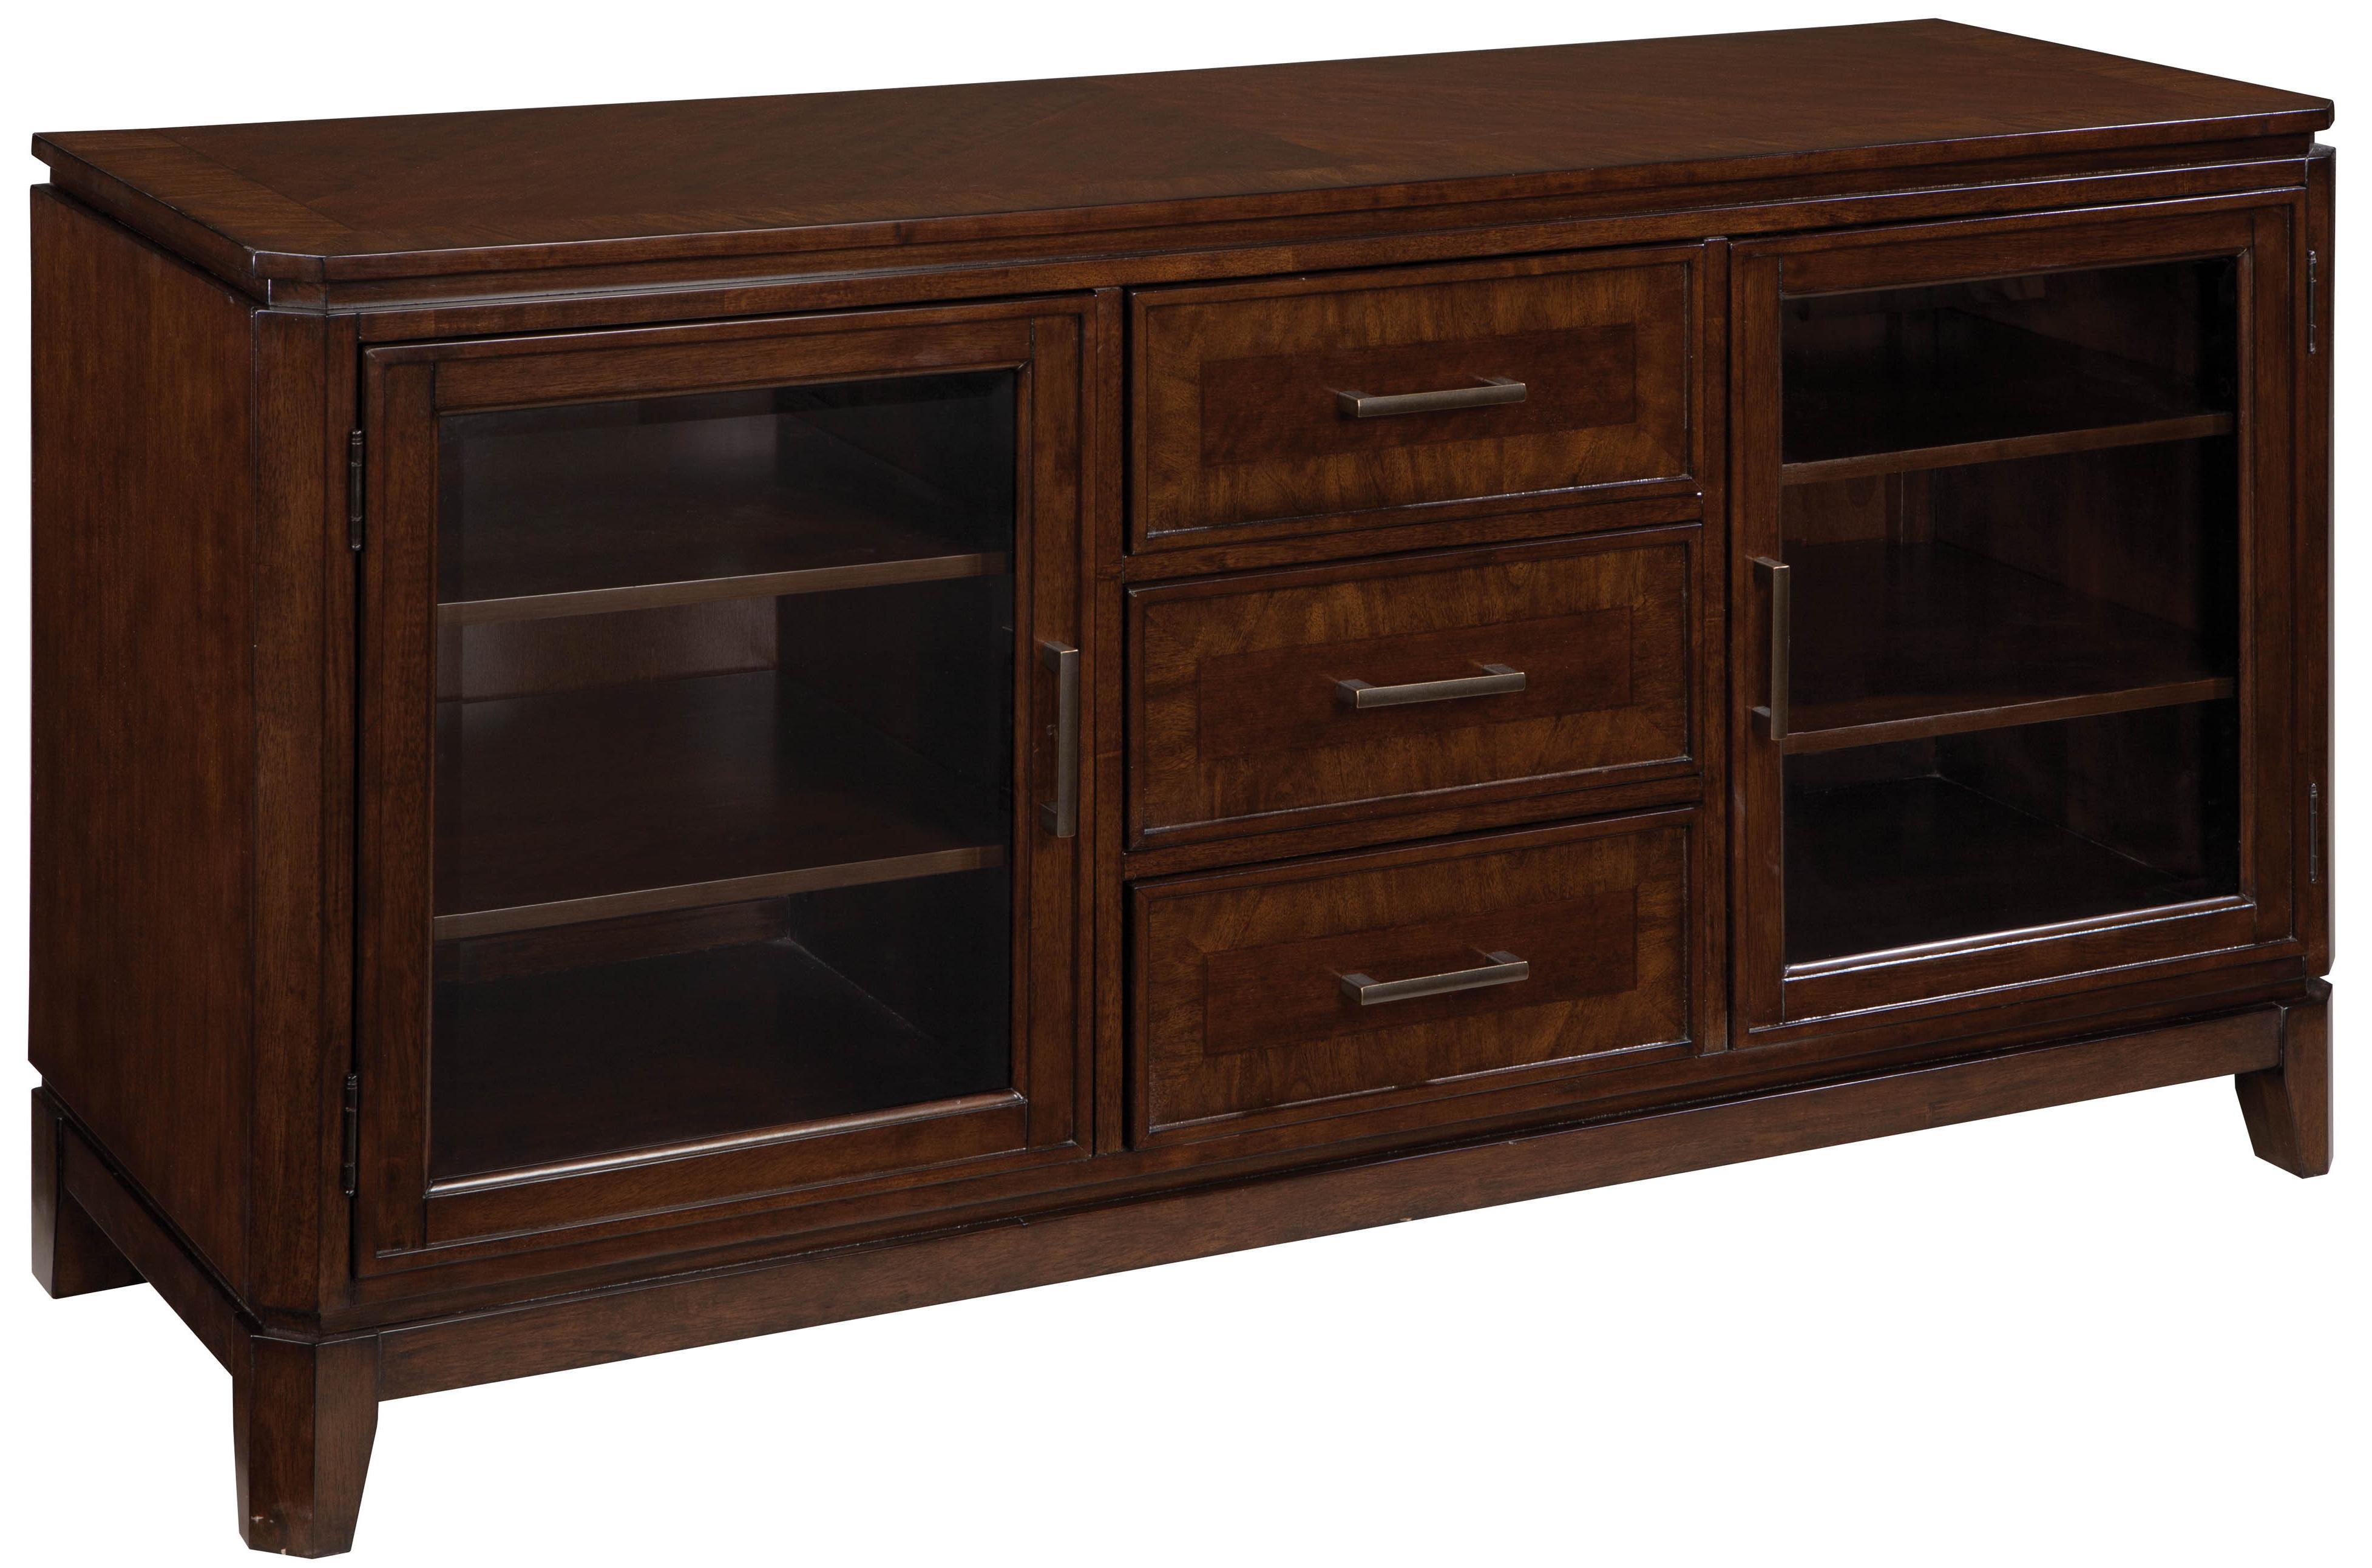 "Standard Furniture Avion  60"" TV Console - Item Number: 22438"